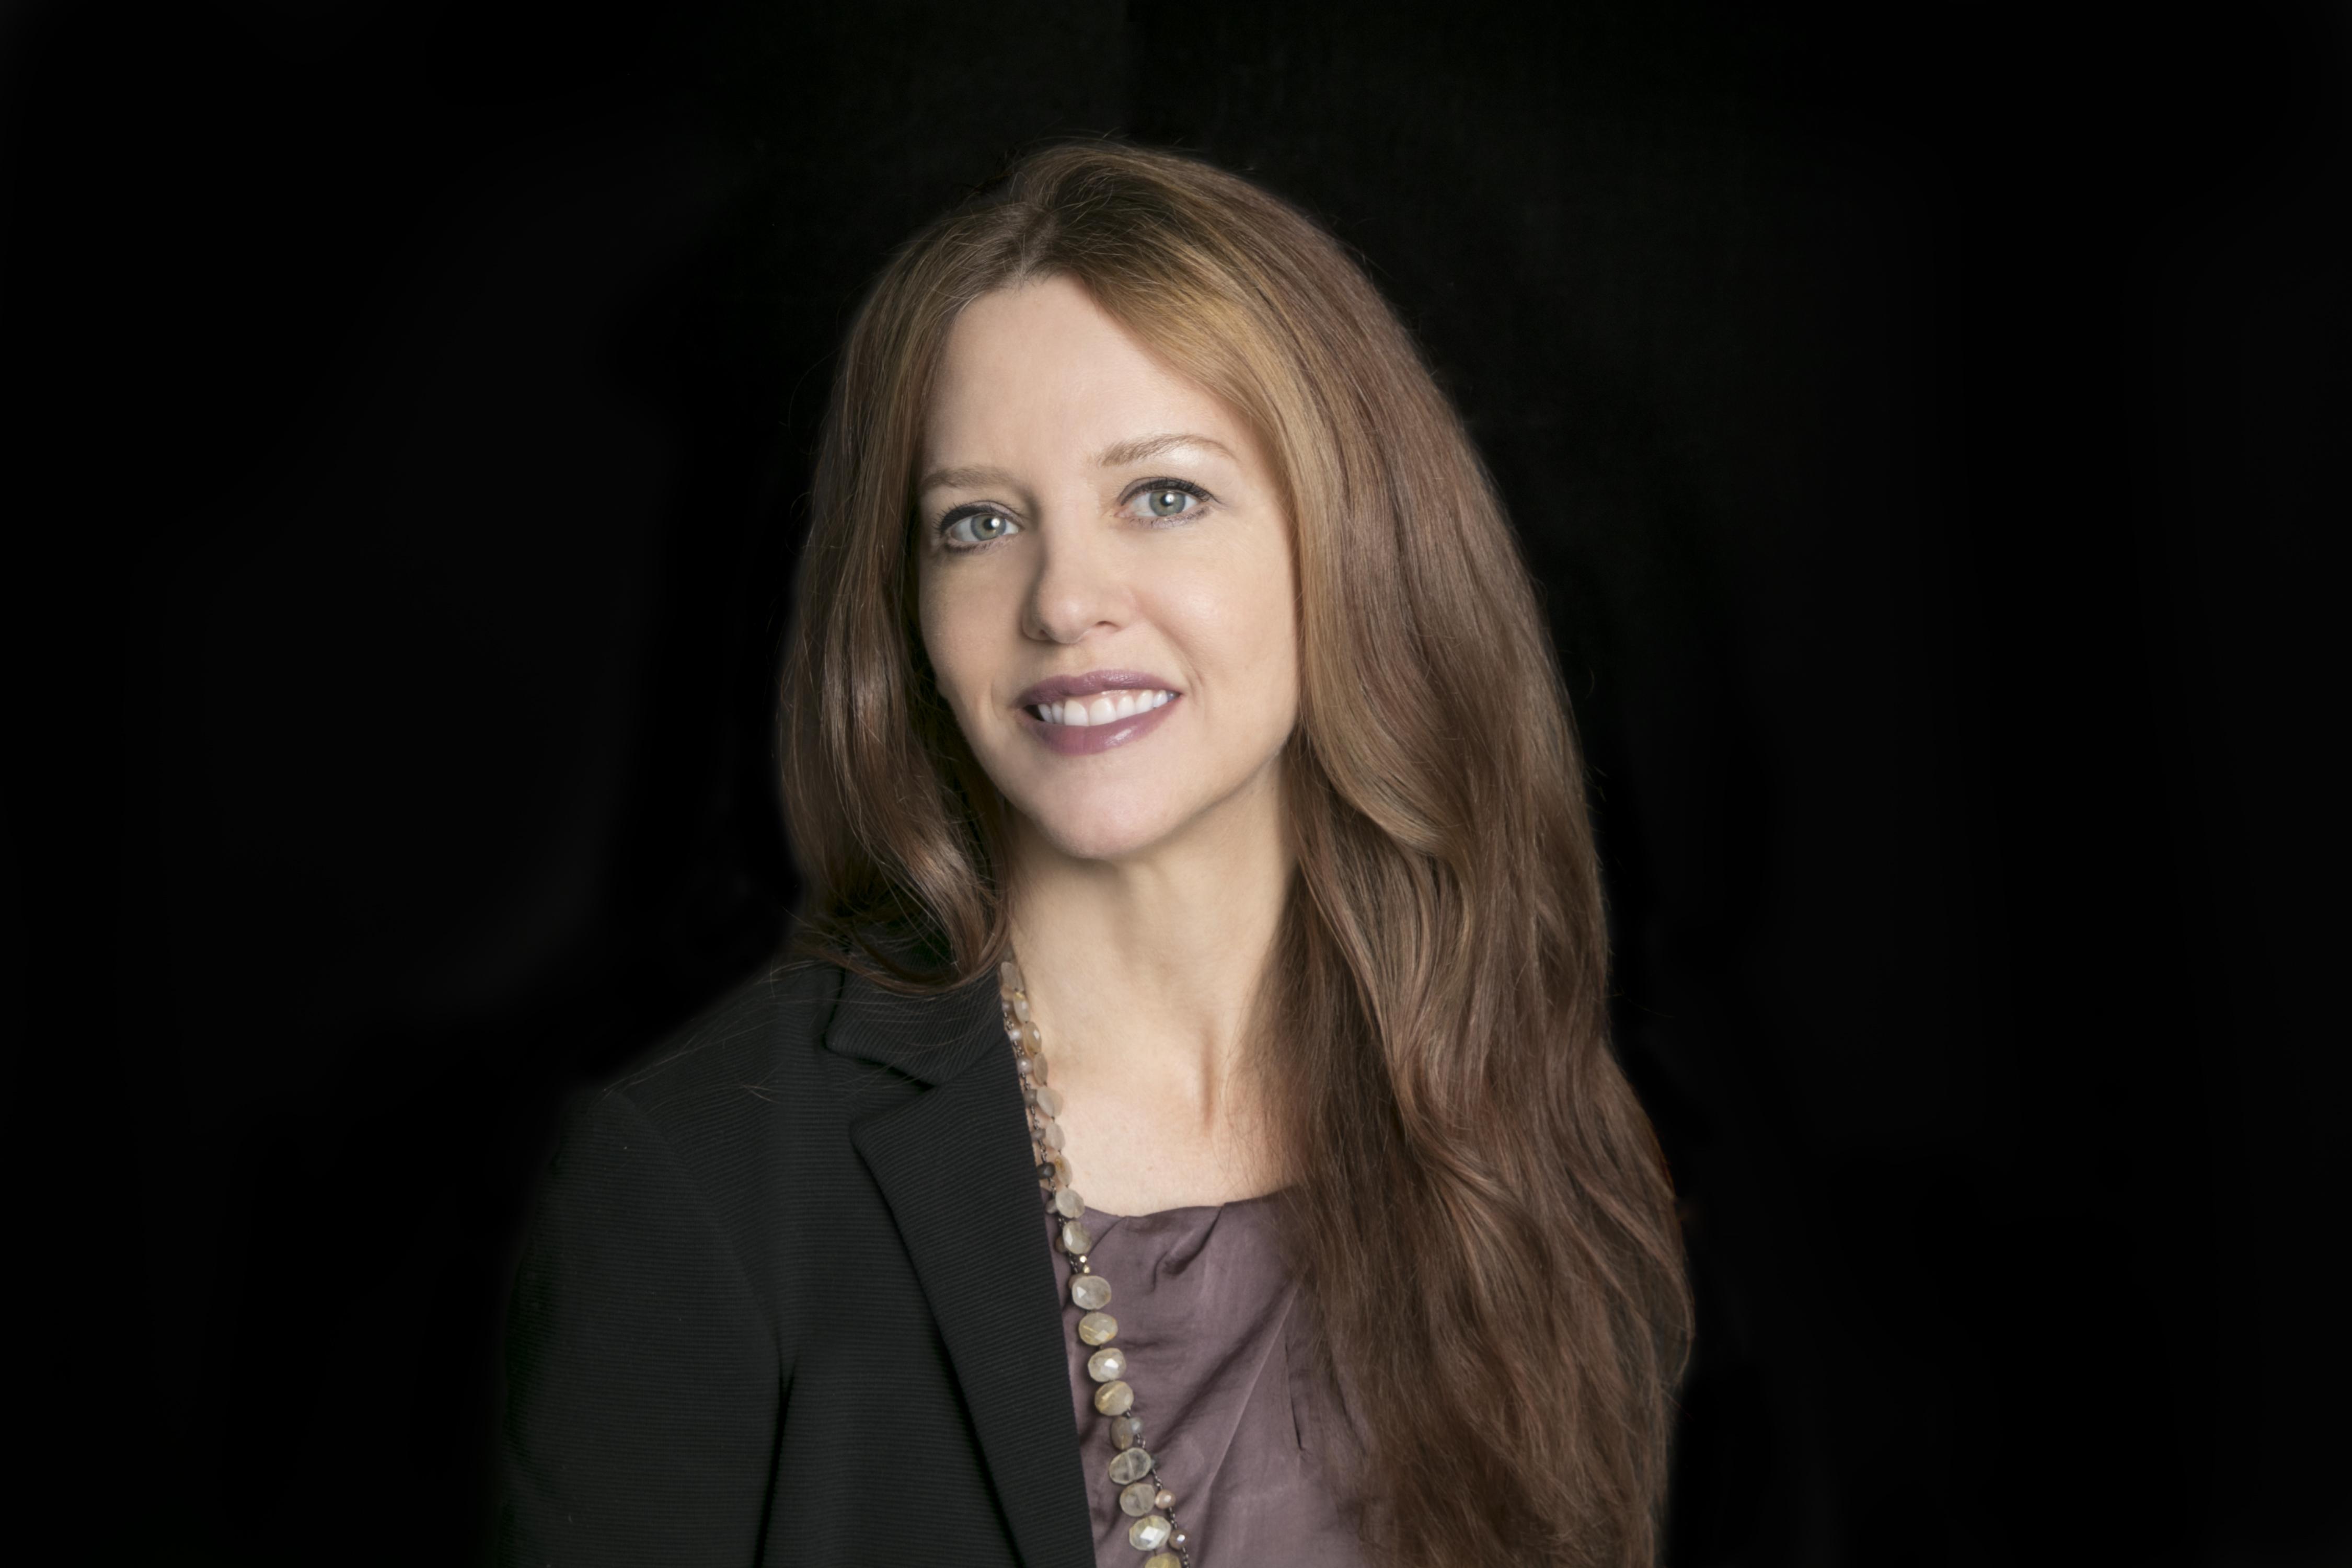 Cindy Combs